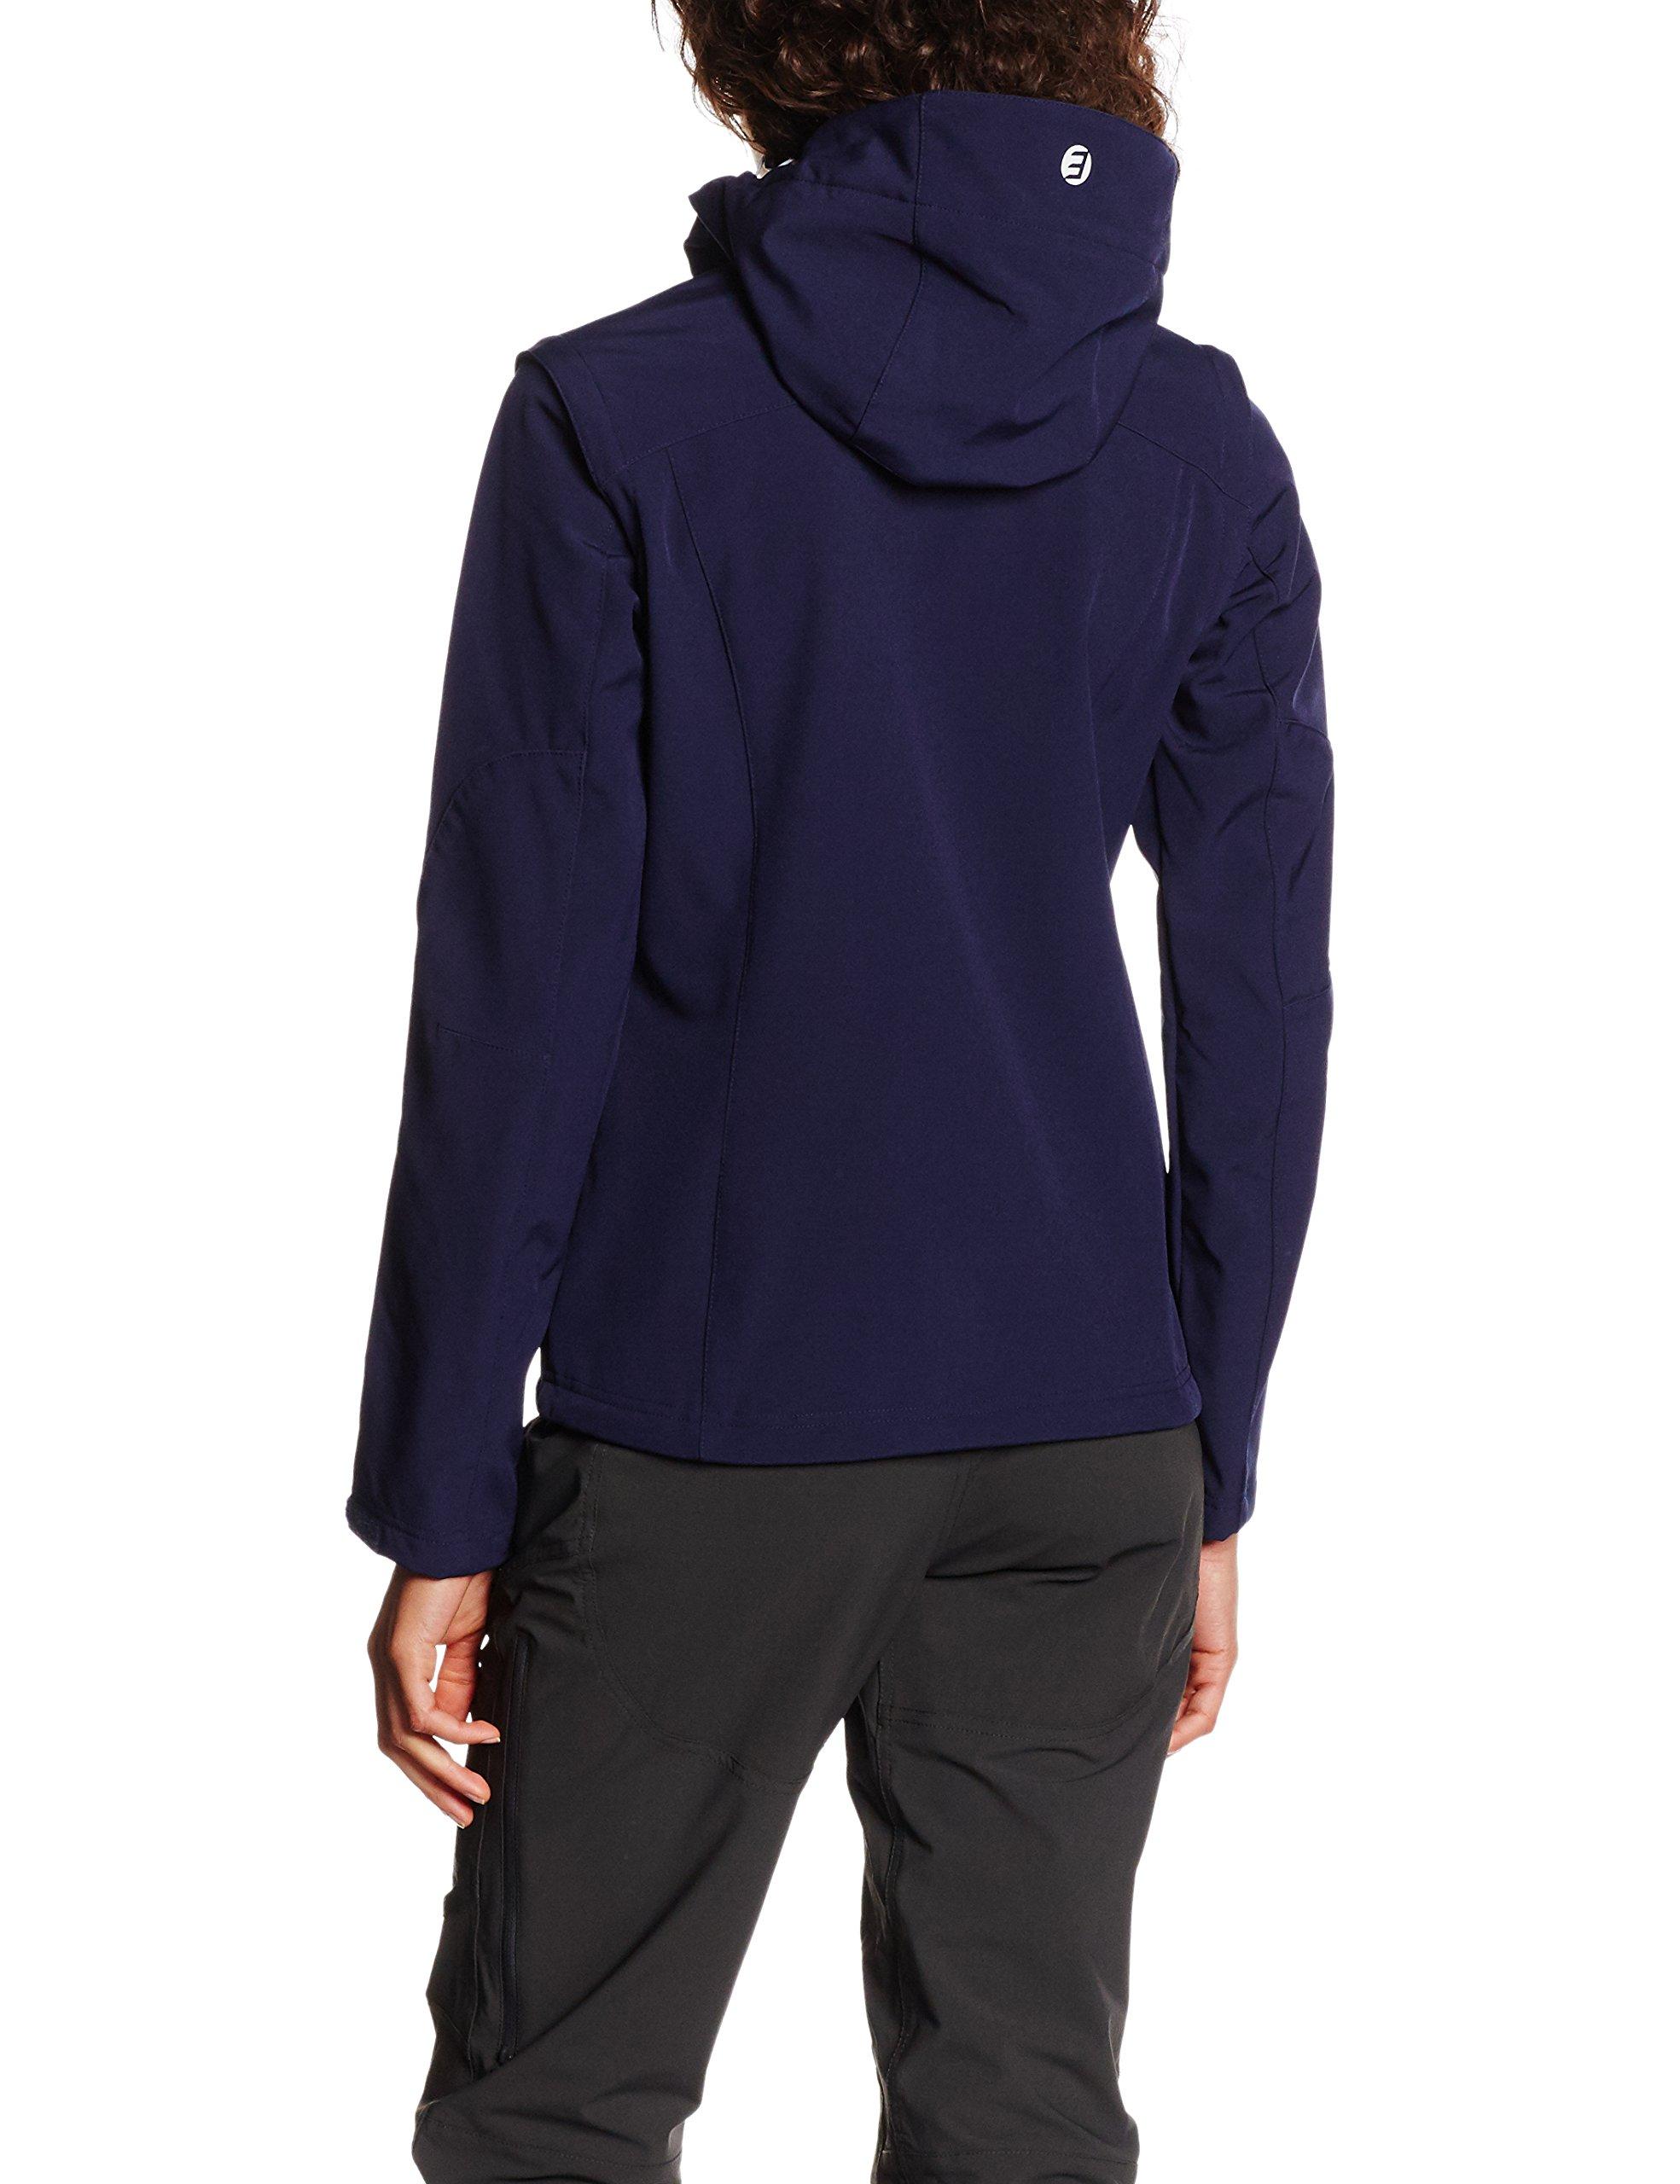 819uGGGhZeL - ICEPEAK Leonie Women's Soft Shell Jacket,